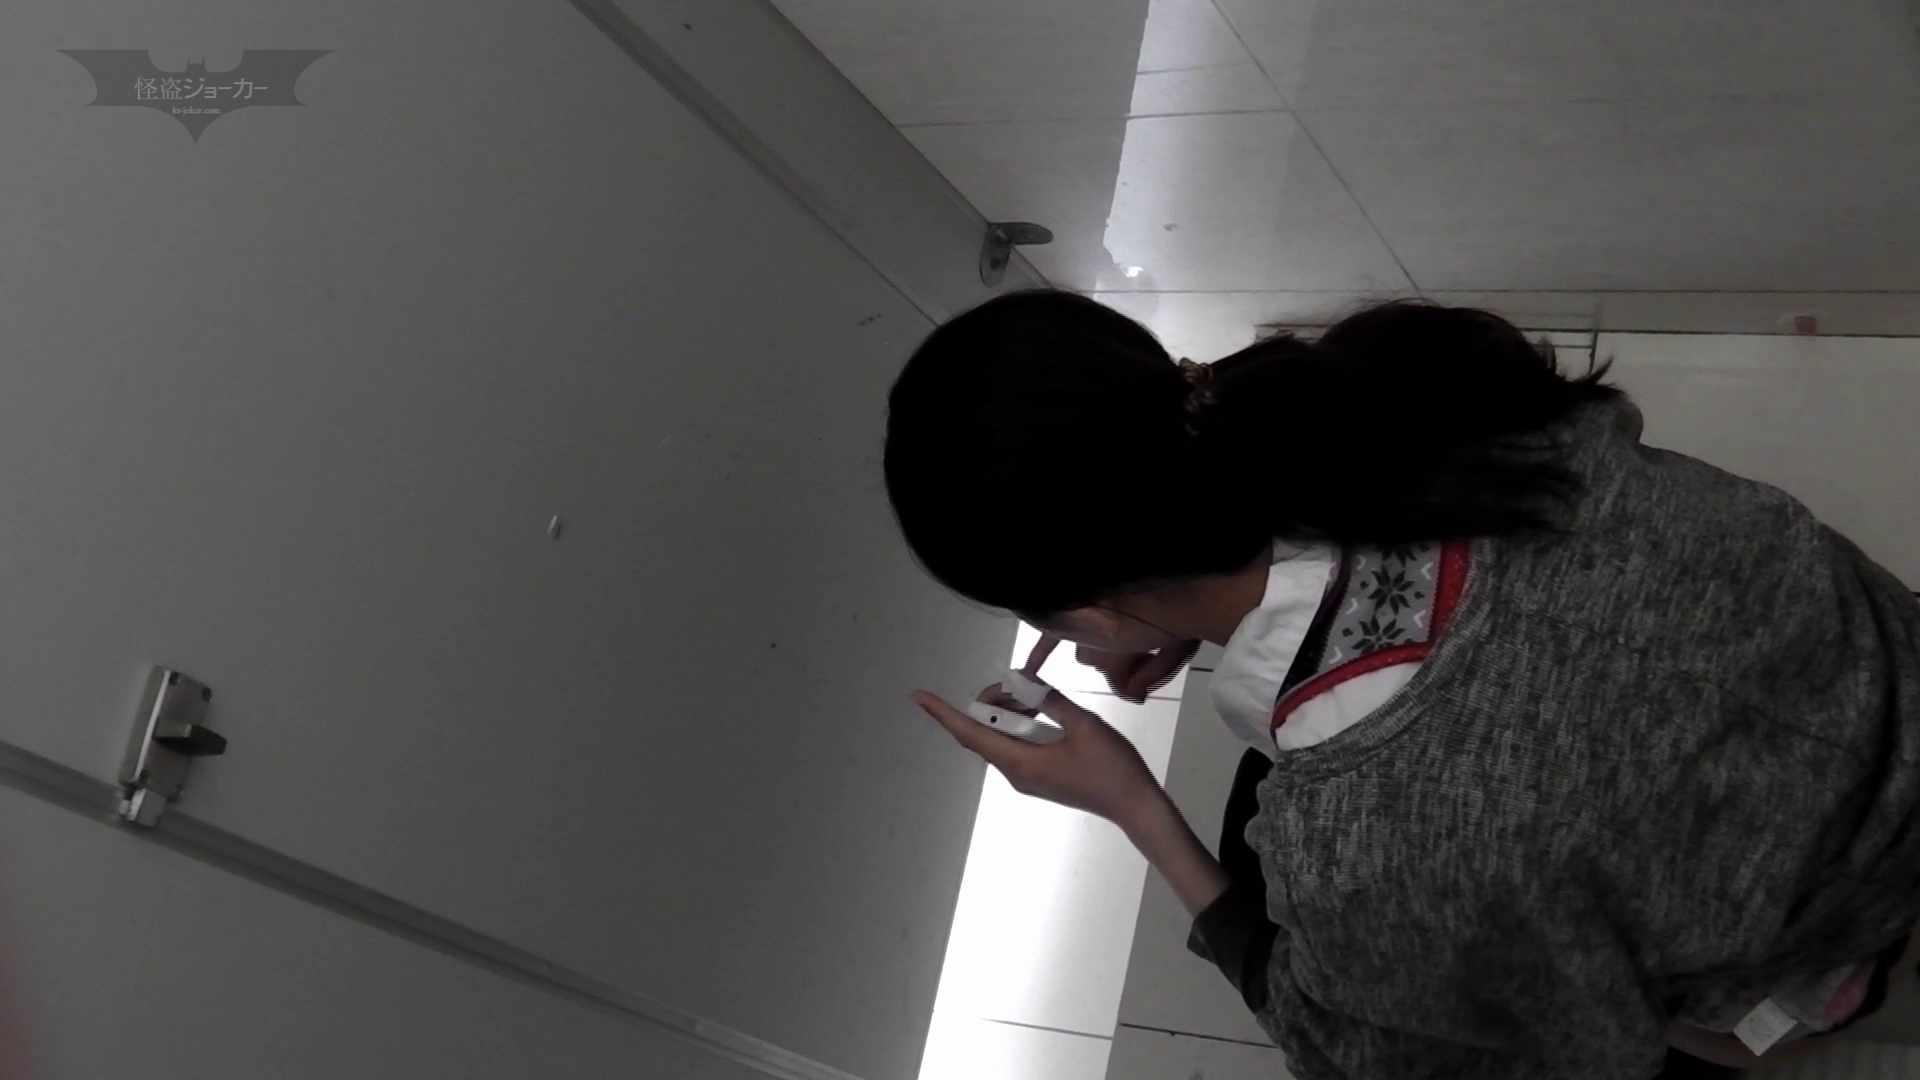 潜入!!台湾名門女学院 Vol.10 進化 高画質 すけべAV動画紹介 89枚 78